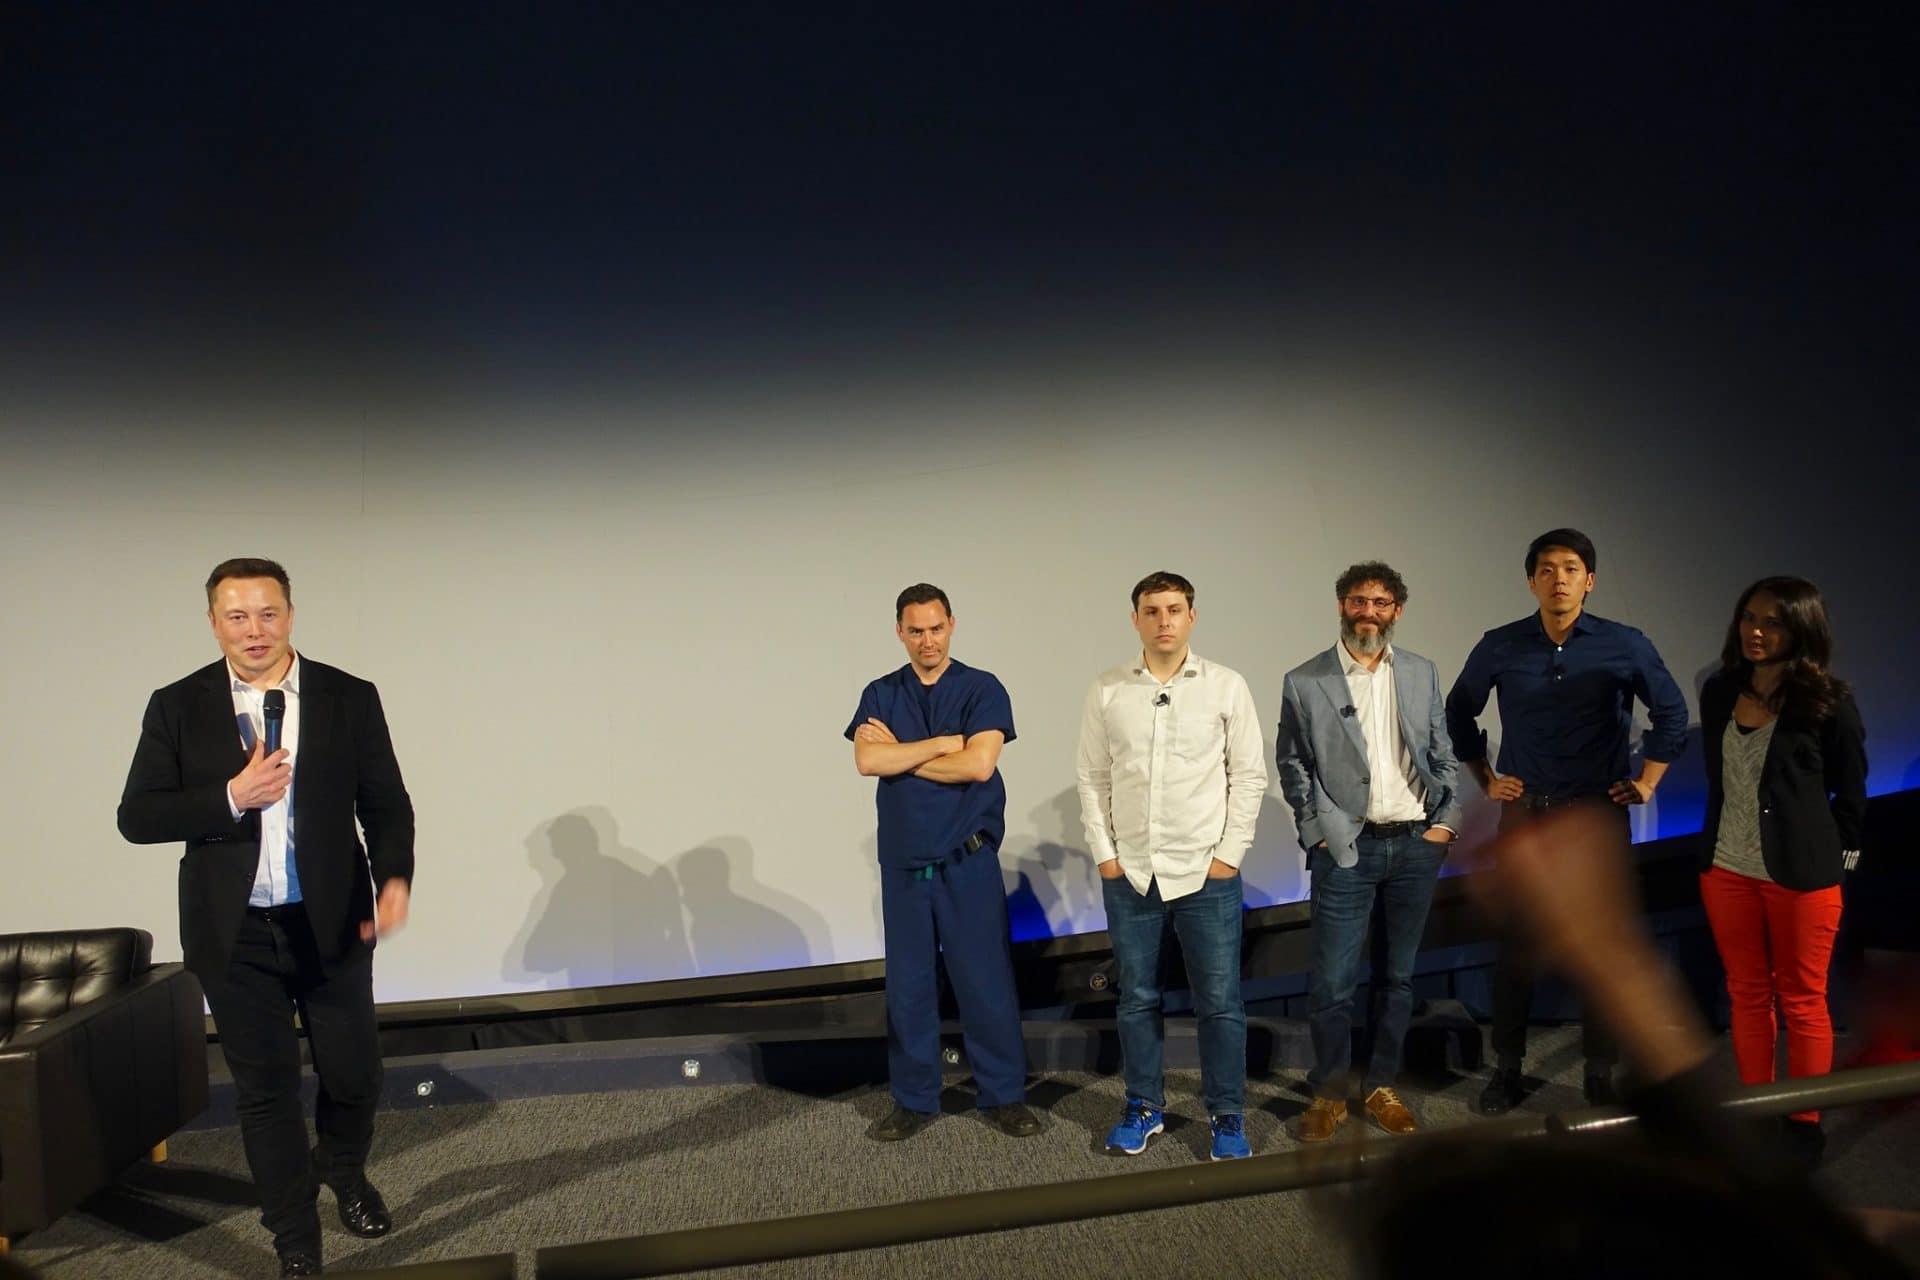 Elon Musk gives a presentation on neurotechnology.